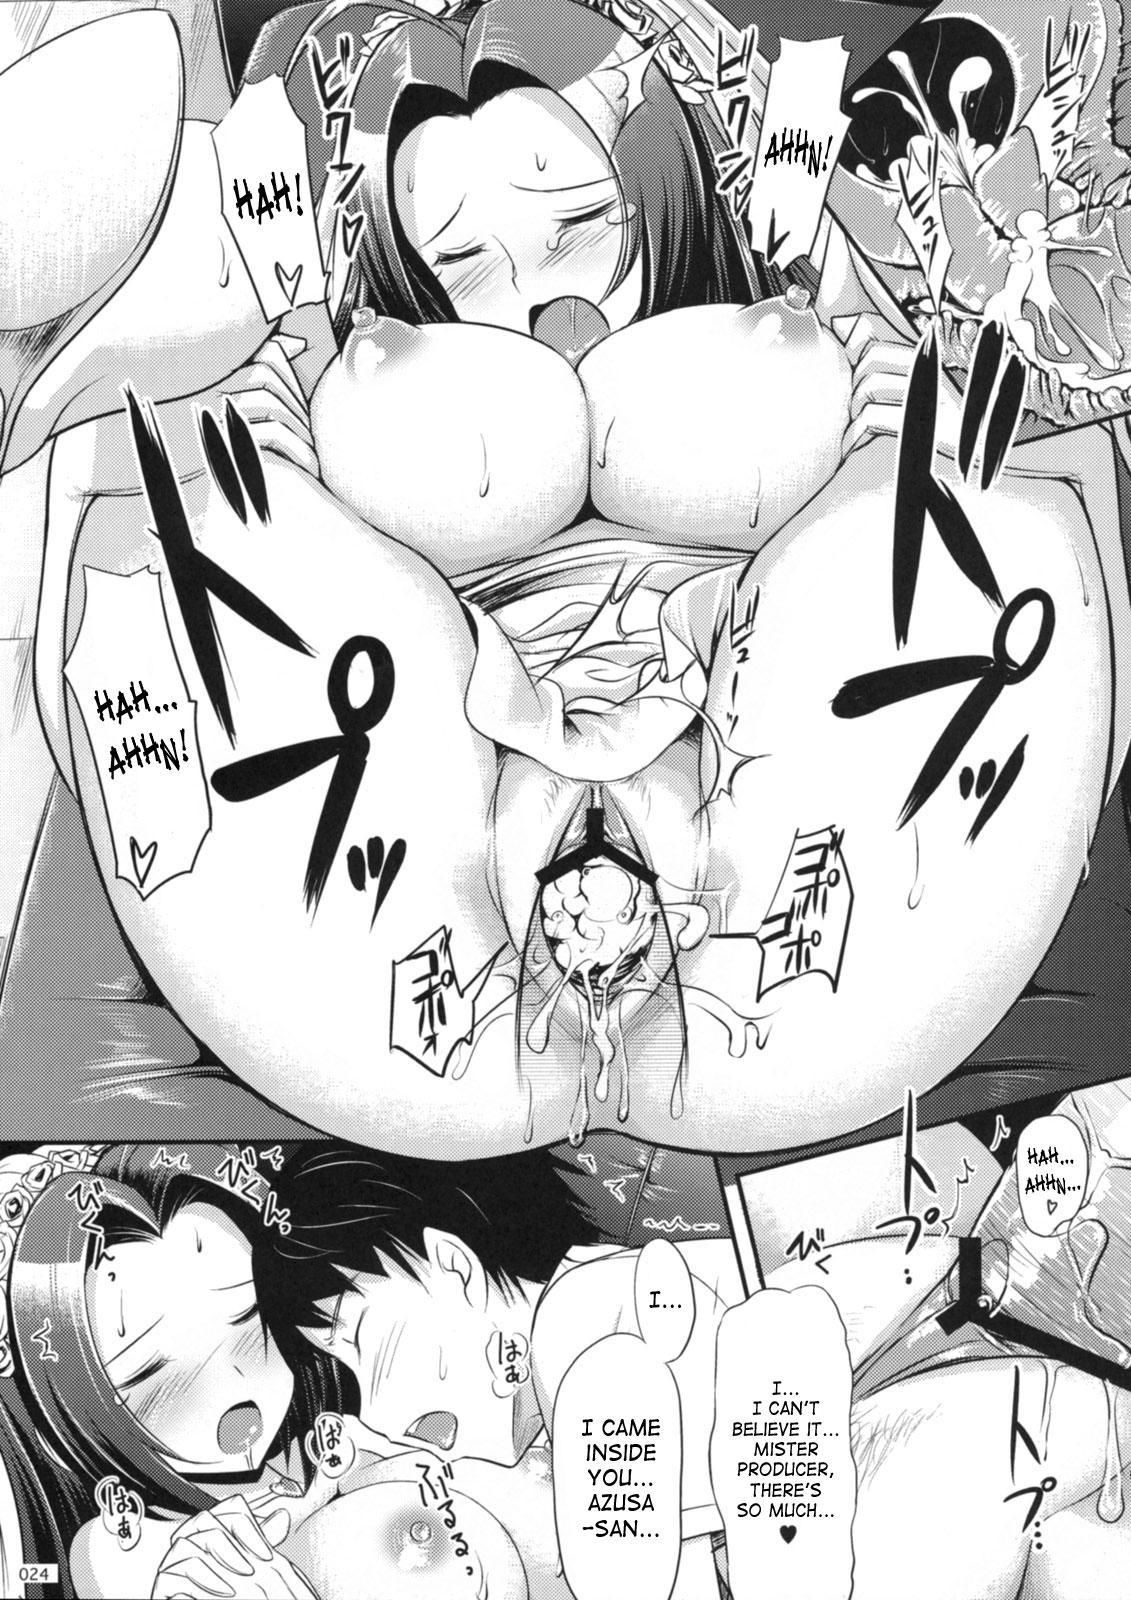 (C74) [Jenoa Cake (Takayaki)] Azusa-san no Present For you!   Azusa-san's Present For You! (THE iDOLM@STER) [English] 24